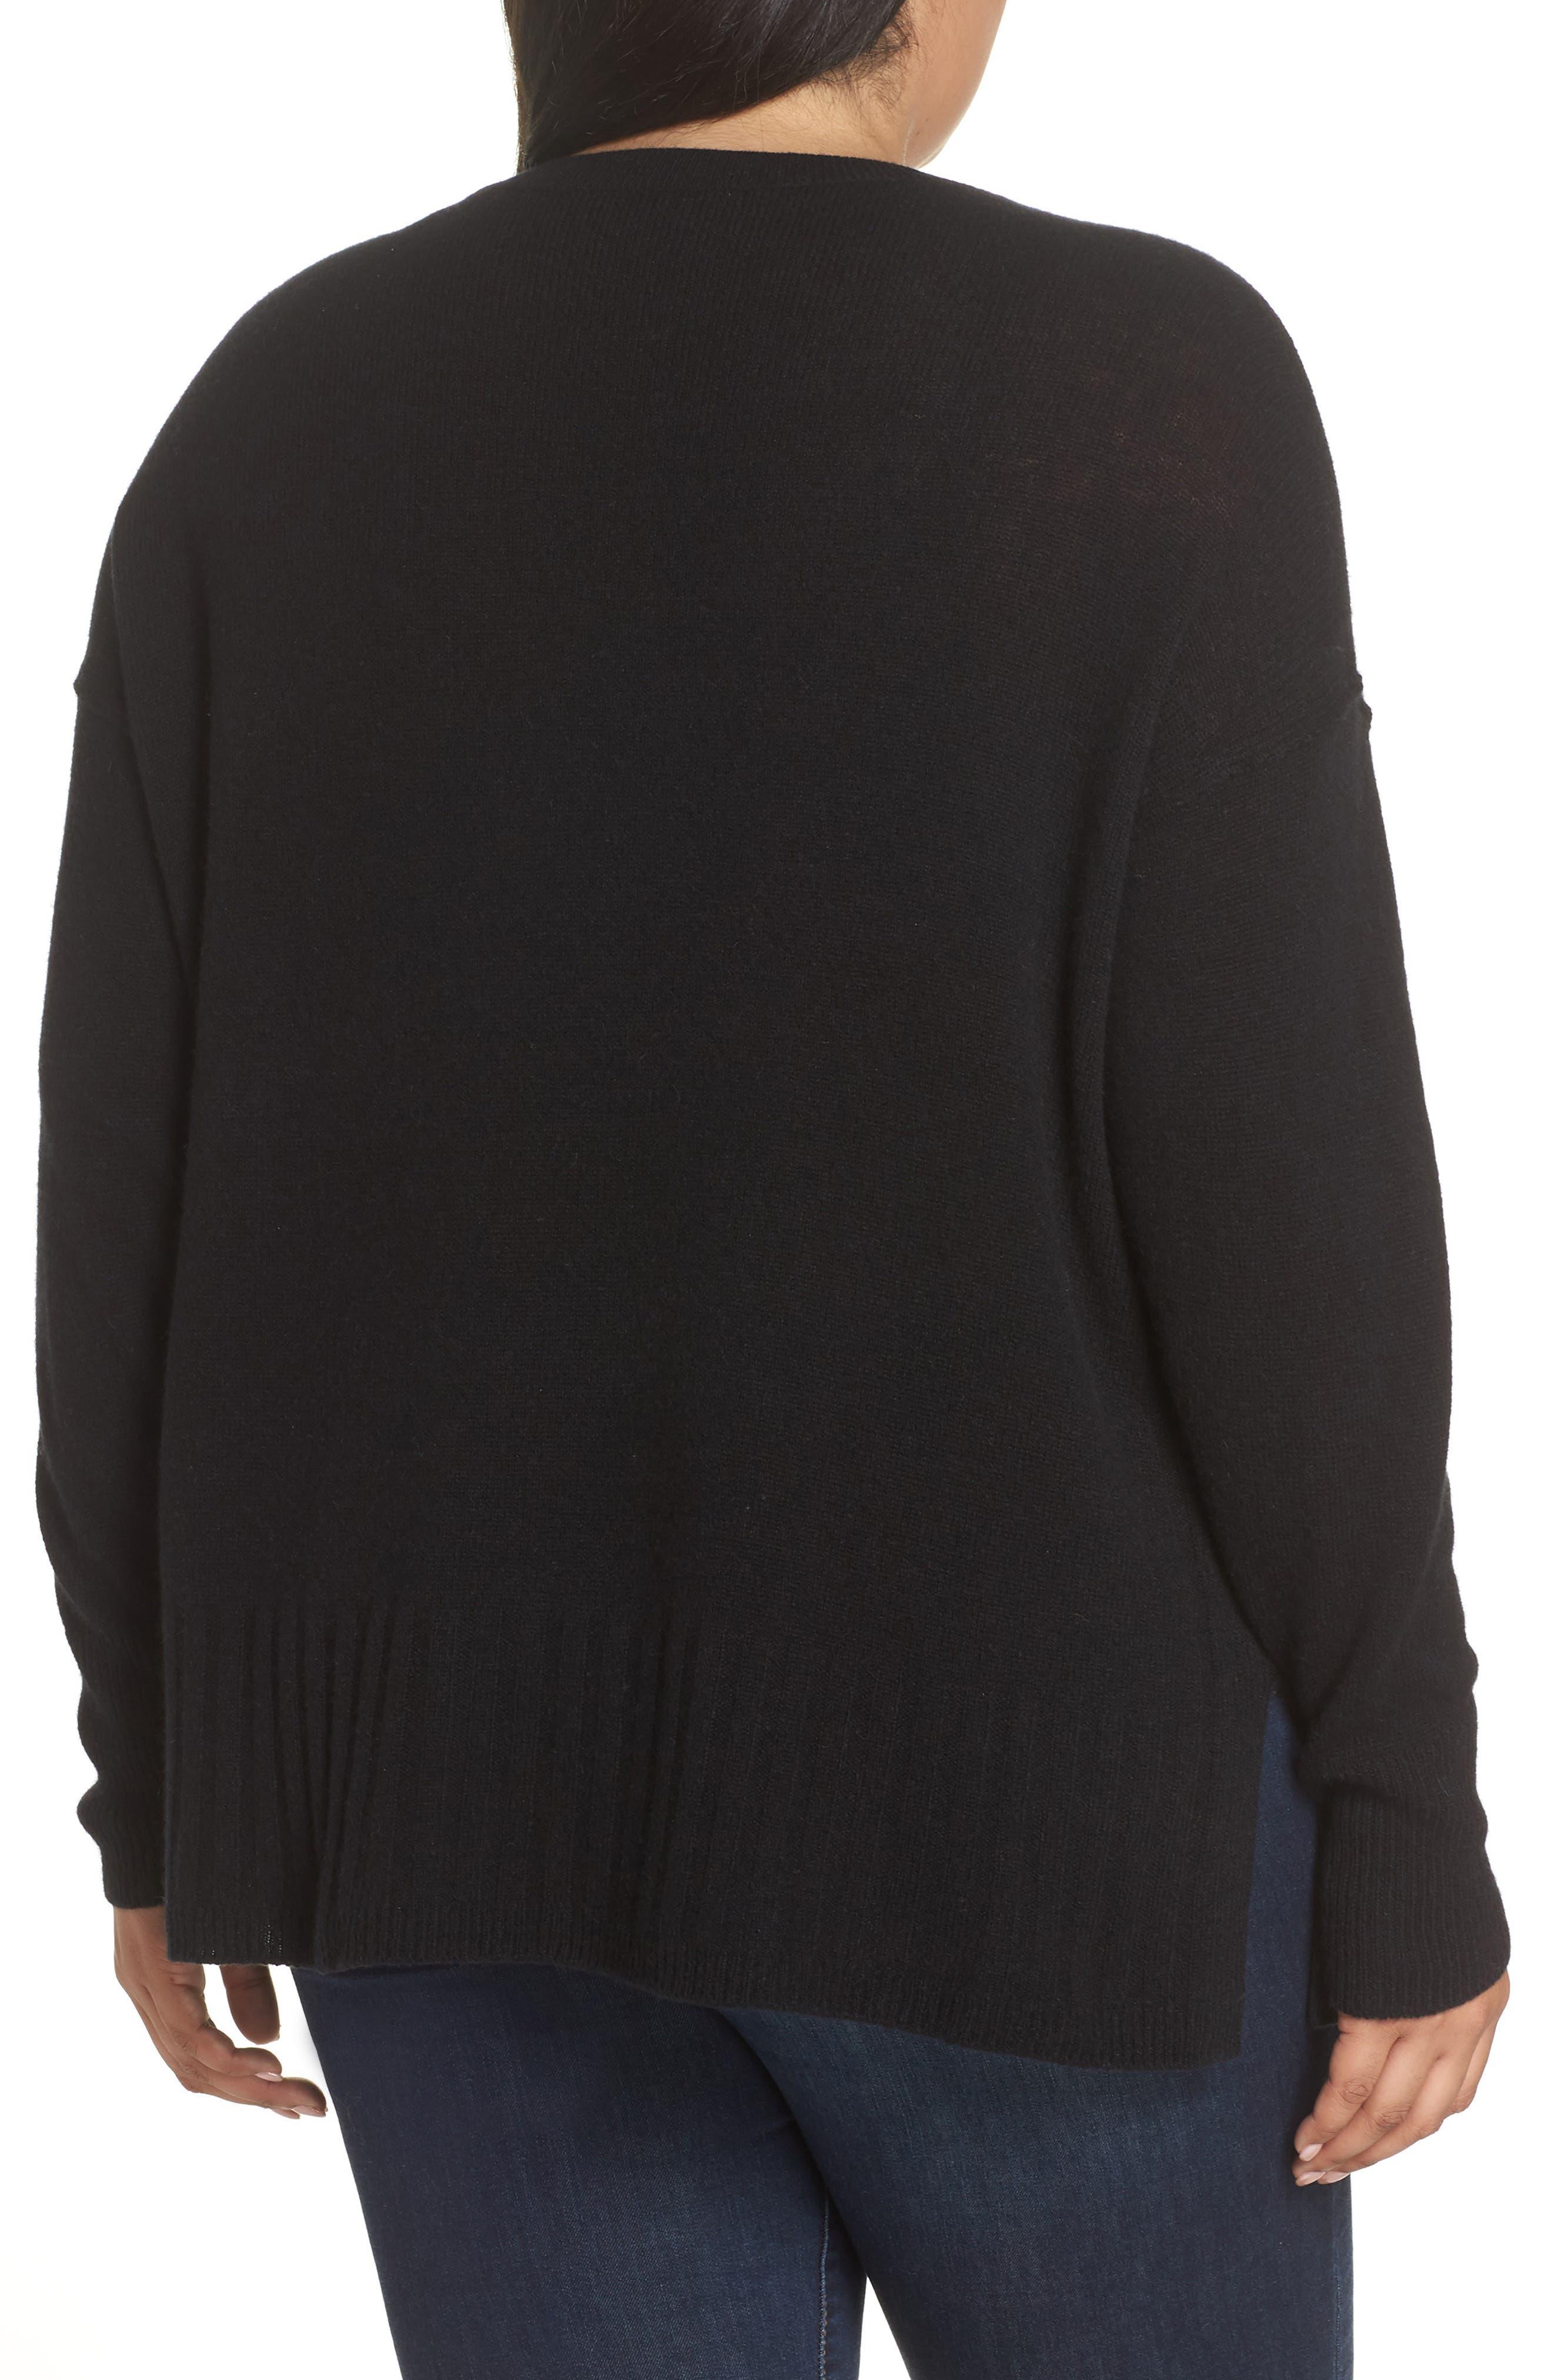 Wool & Cashmere Side Split Pullover,                             Alternate thumbnail 2, color,                             BLACK